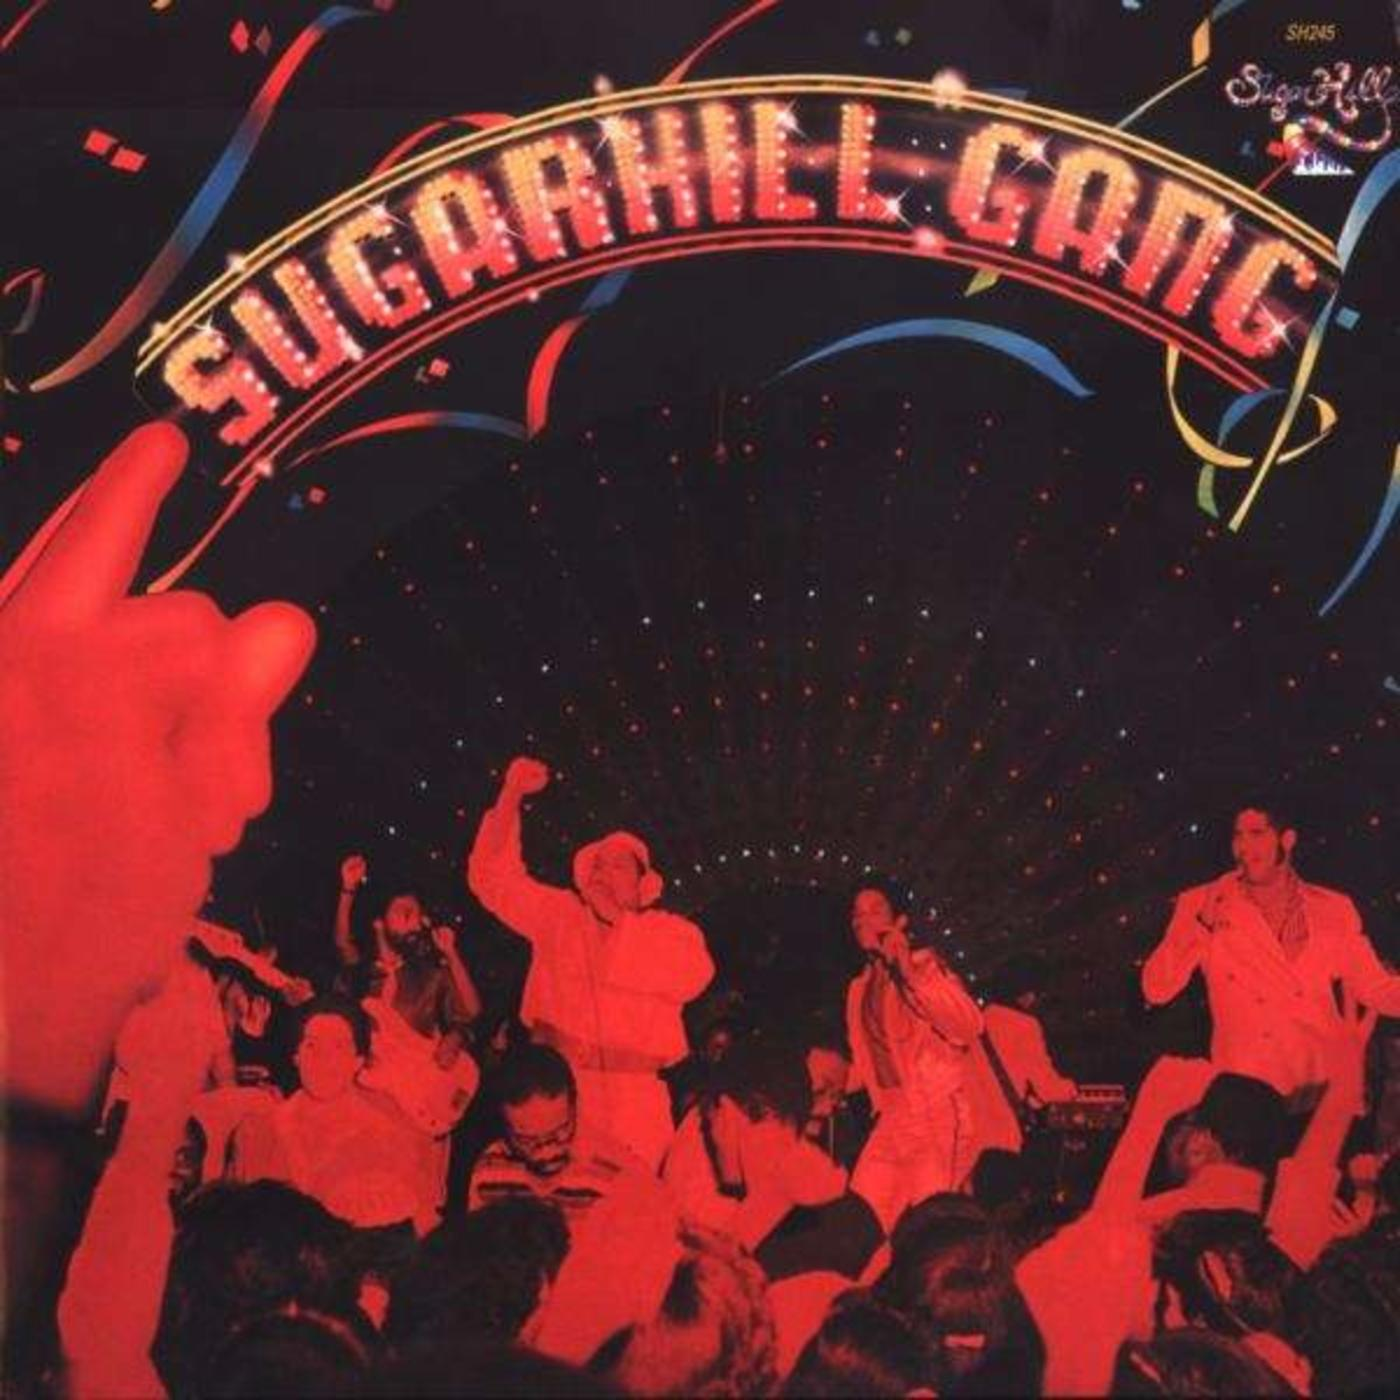 sugarhill_gang album cover